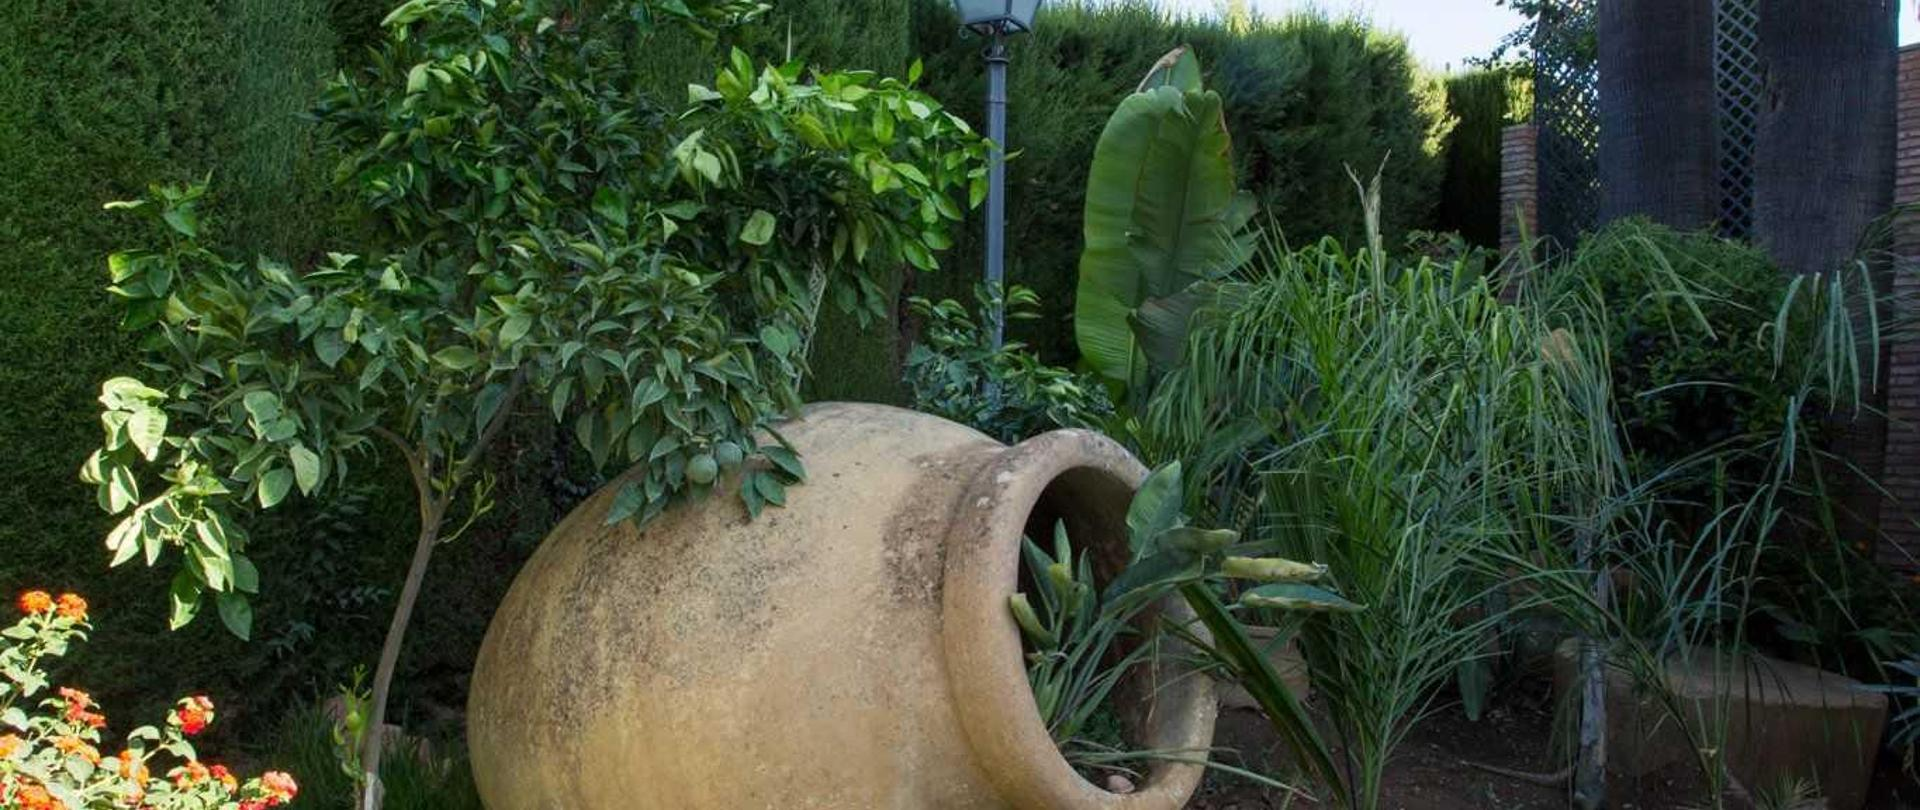 detalle-rincon-jardin.JPG